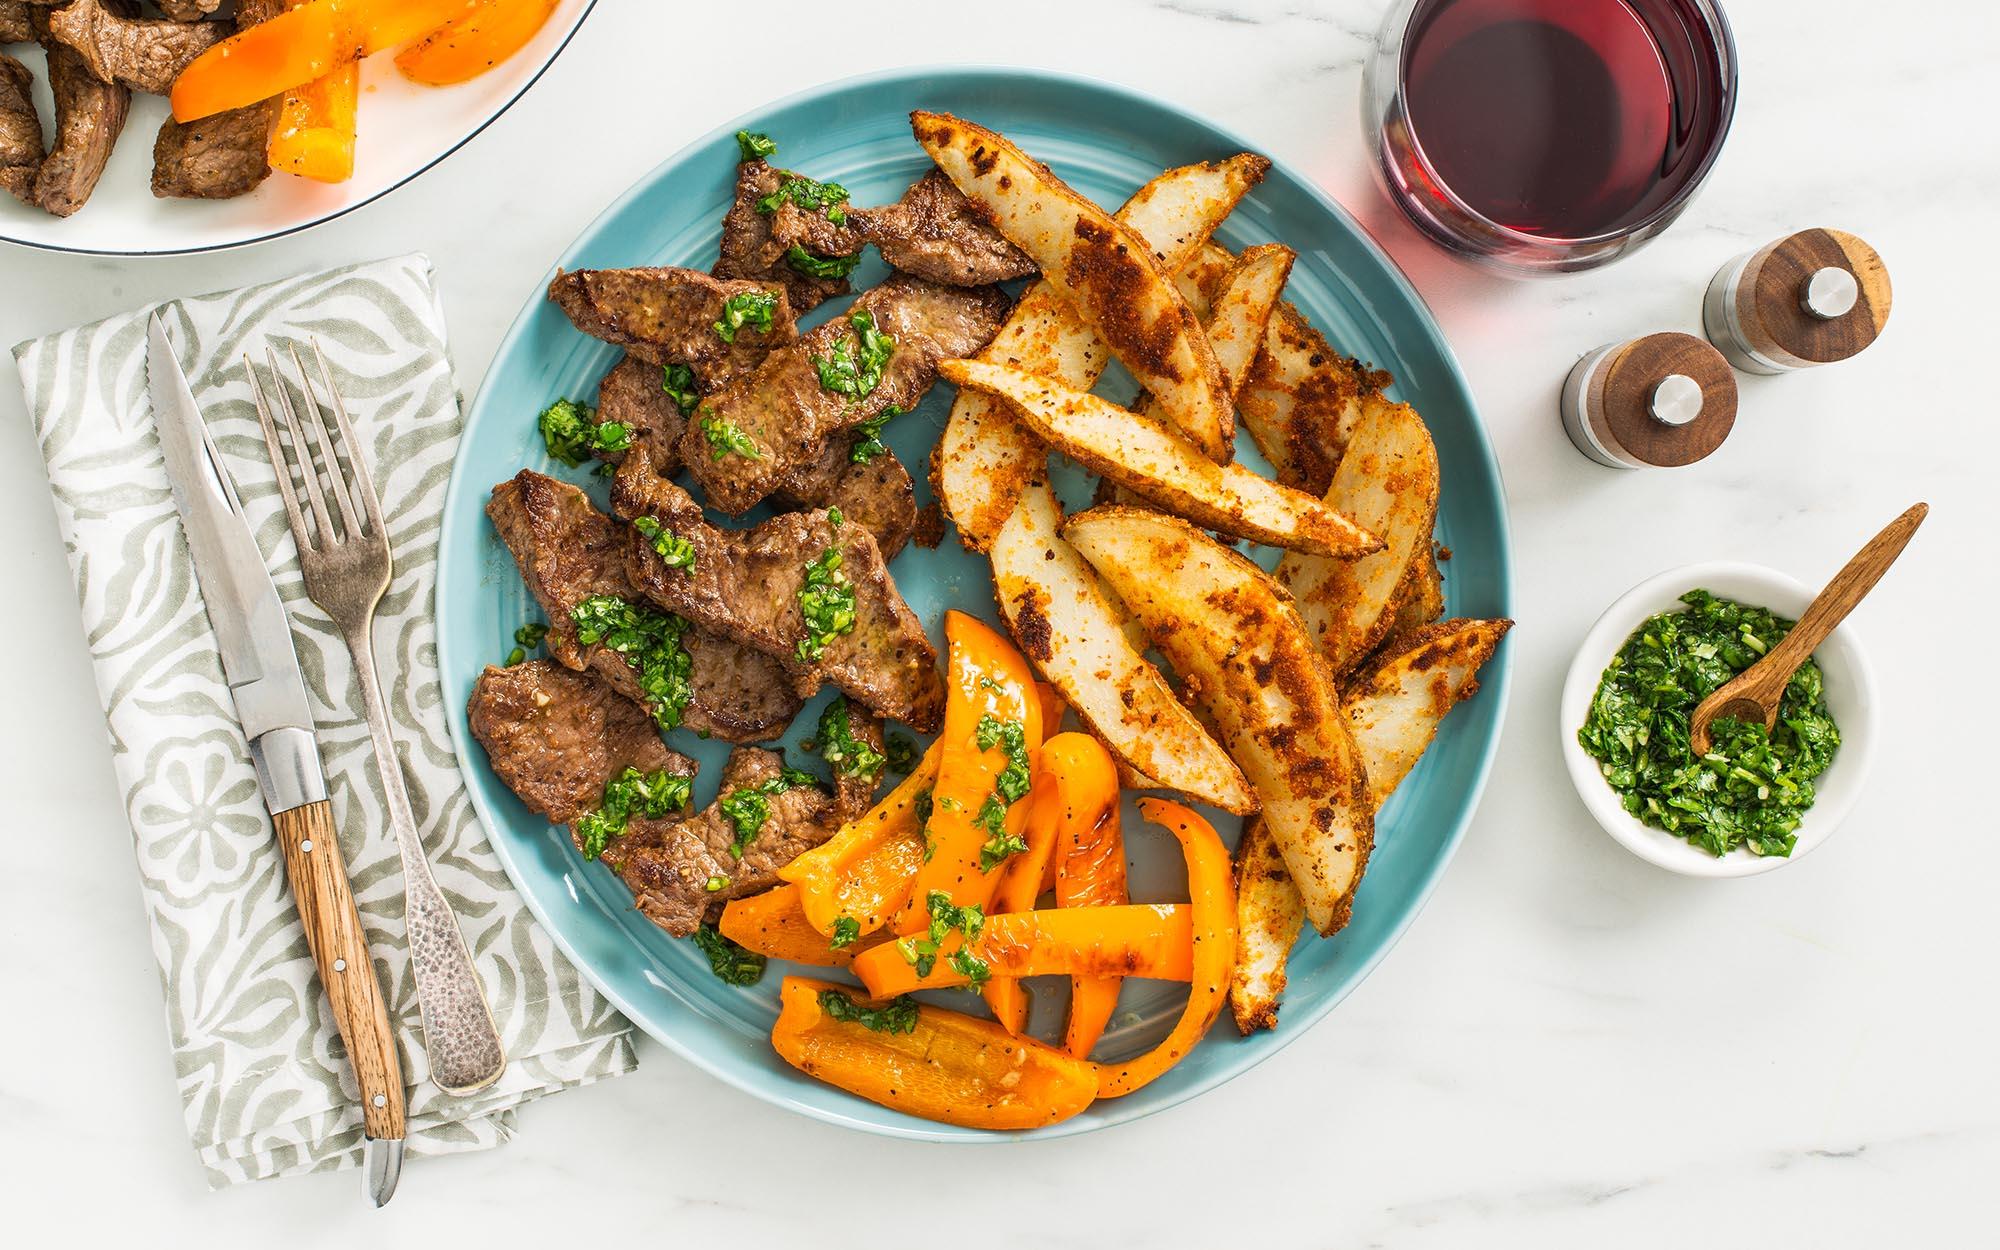 Steak & Lime Chimichurri Sauce